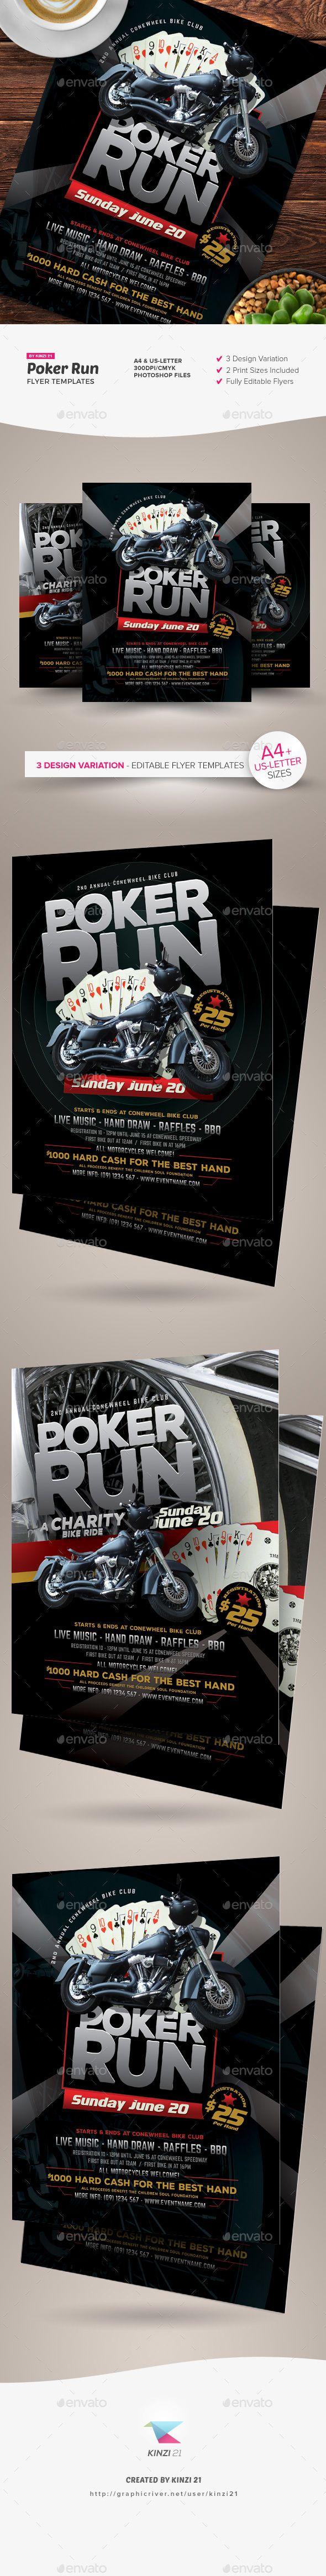 Download Poker Run Flyer Templates Flyer template, Flyer